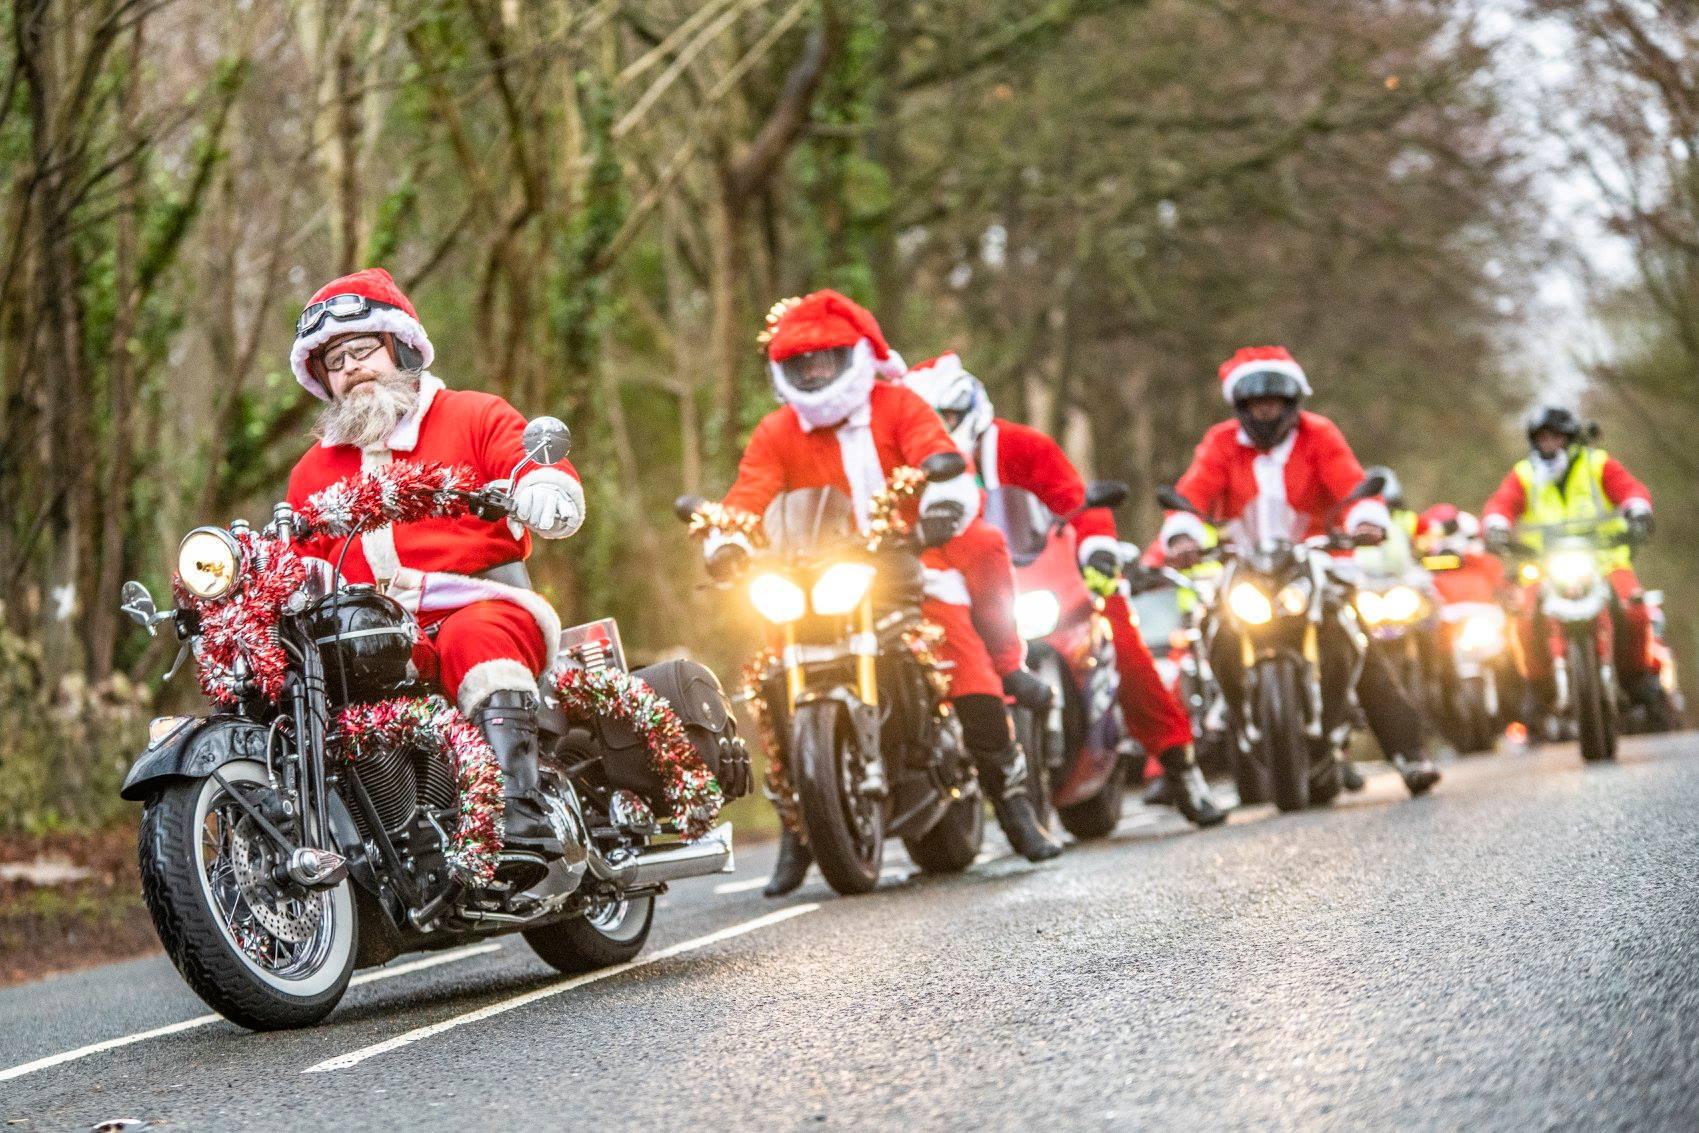 Коледна обиколка с благородна кауза организират добричките мотоциклетисти